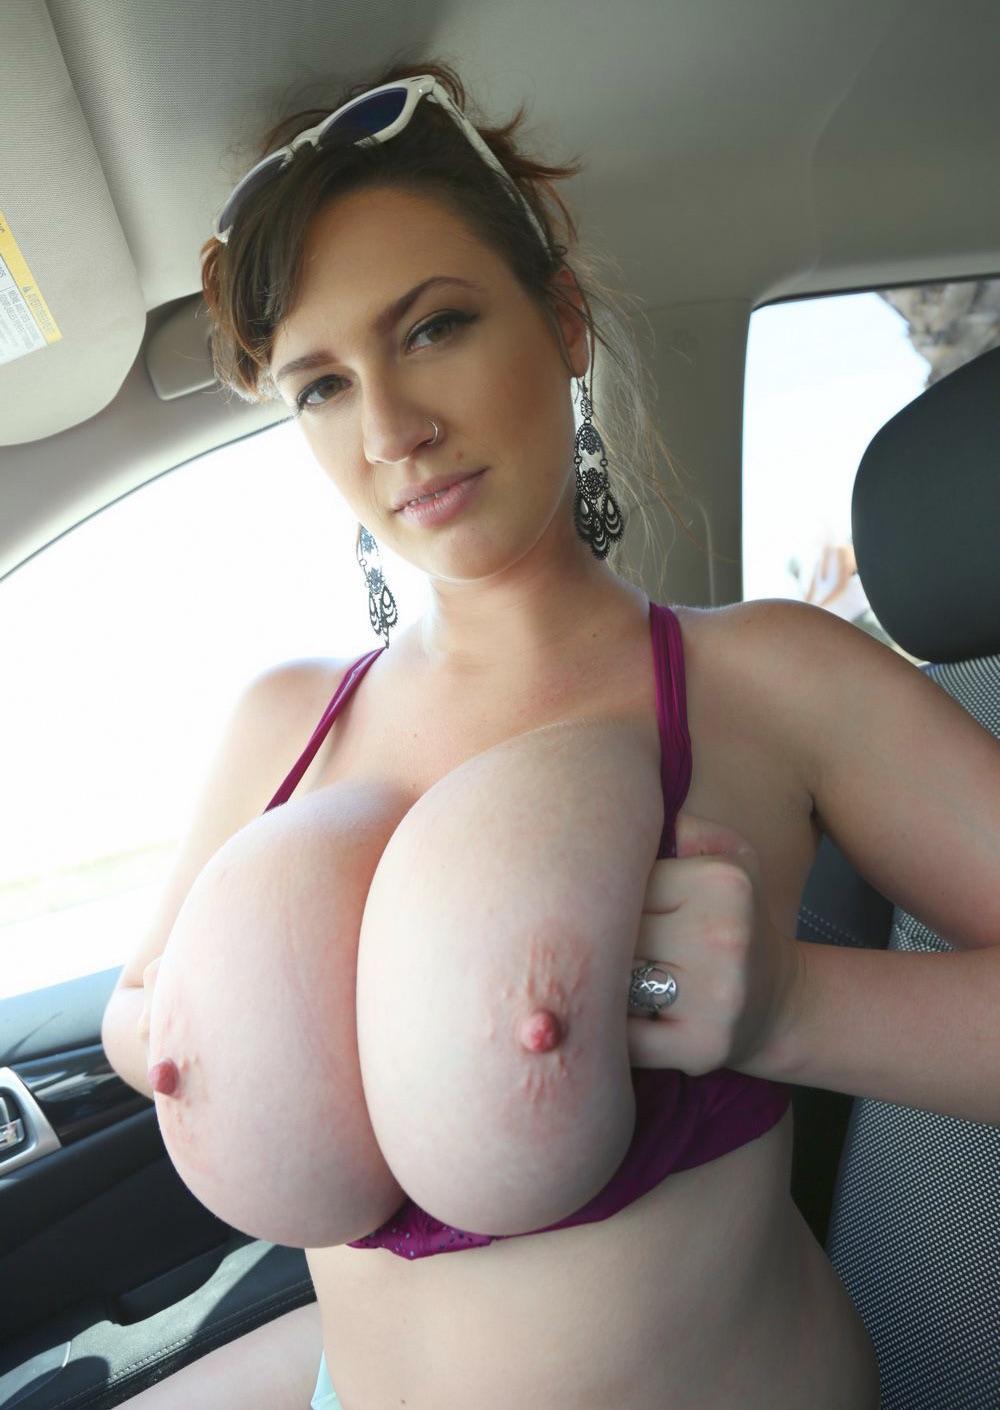 Tits porno huge Tits Hits